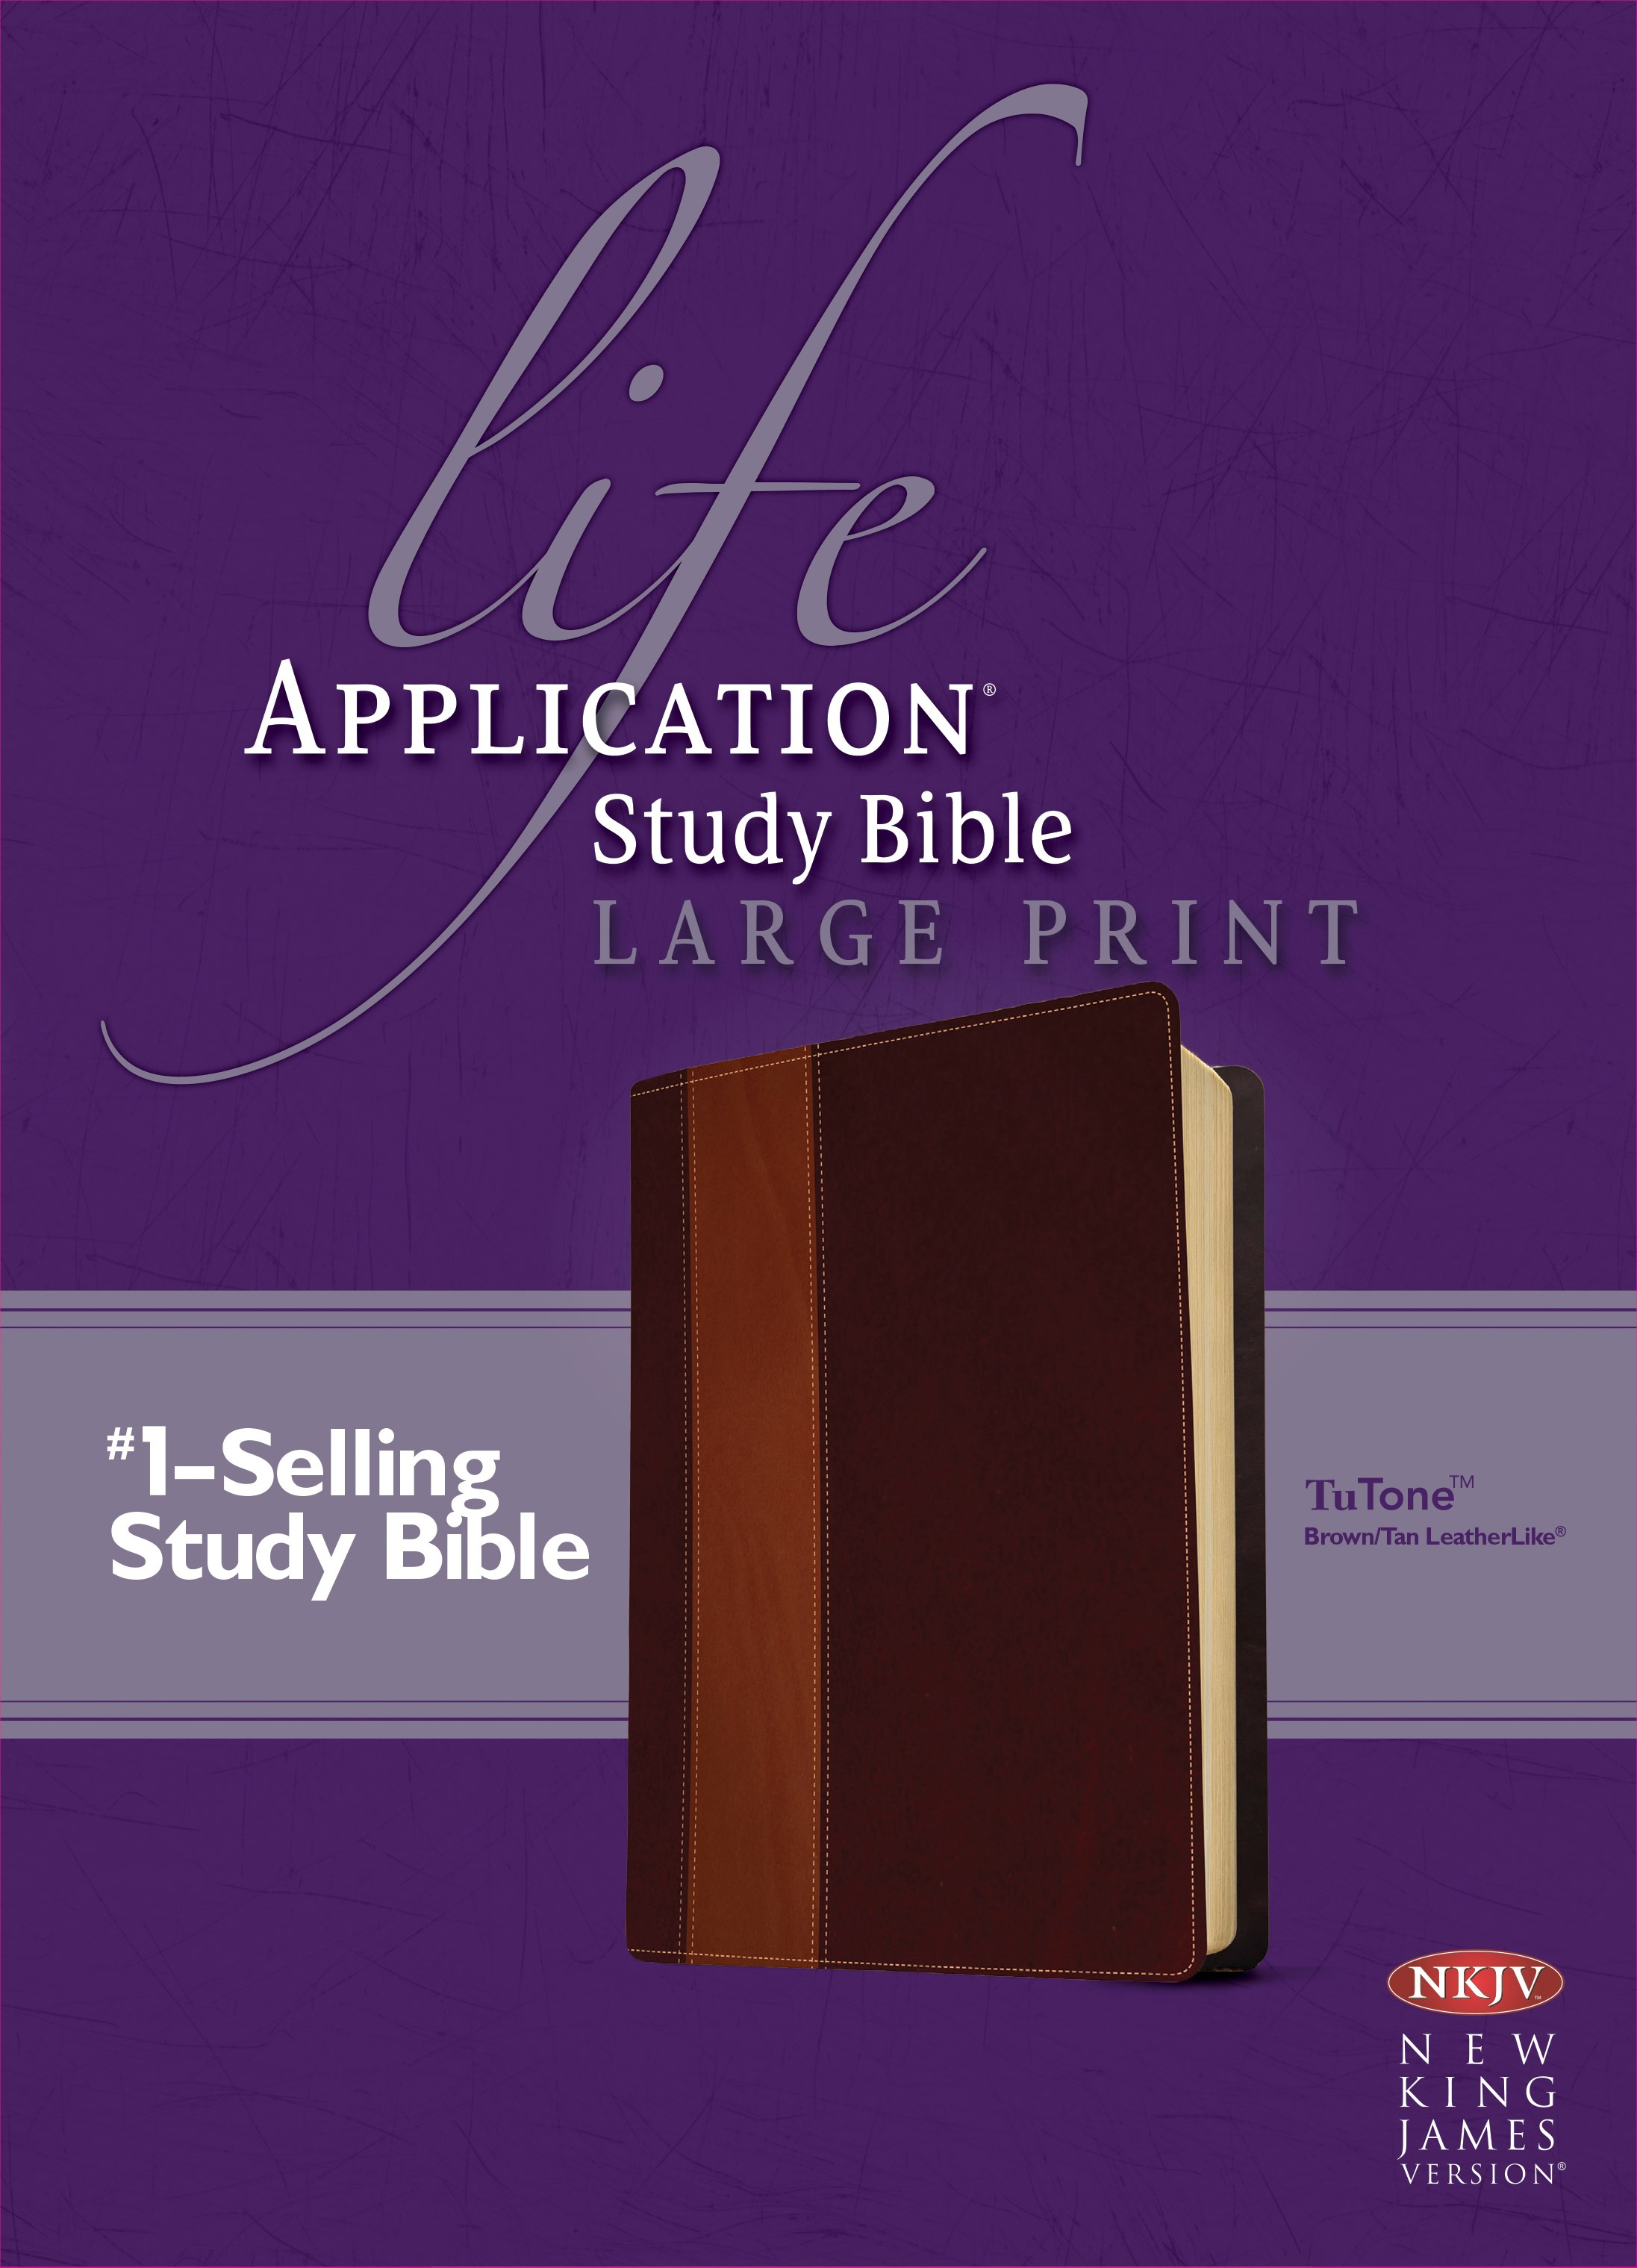 NKJV Life Application Study Bible/Large Print-Brown/Tan TuTone